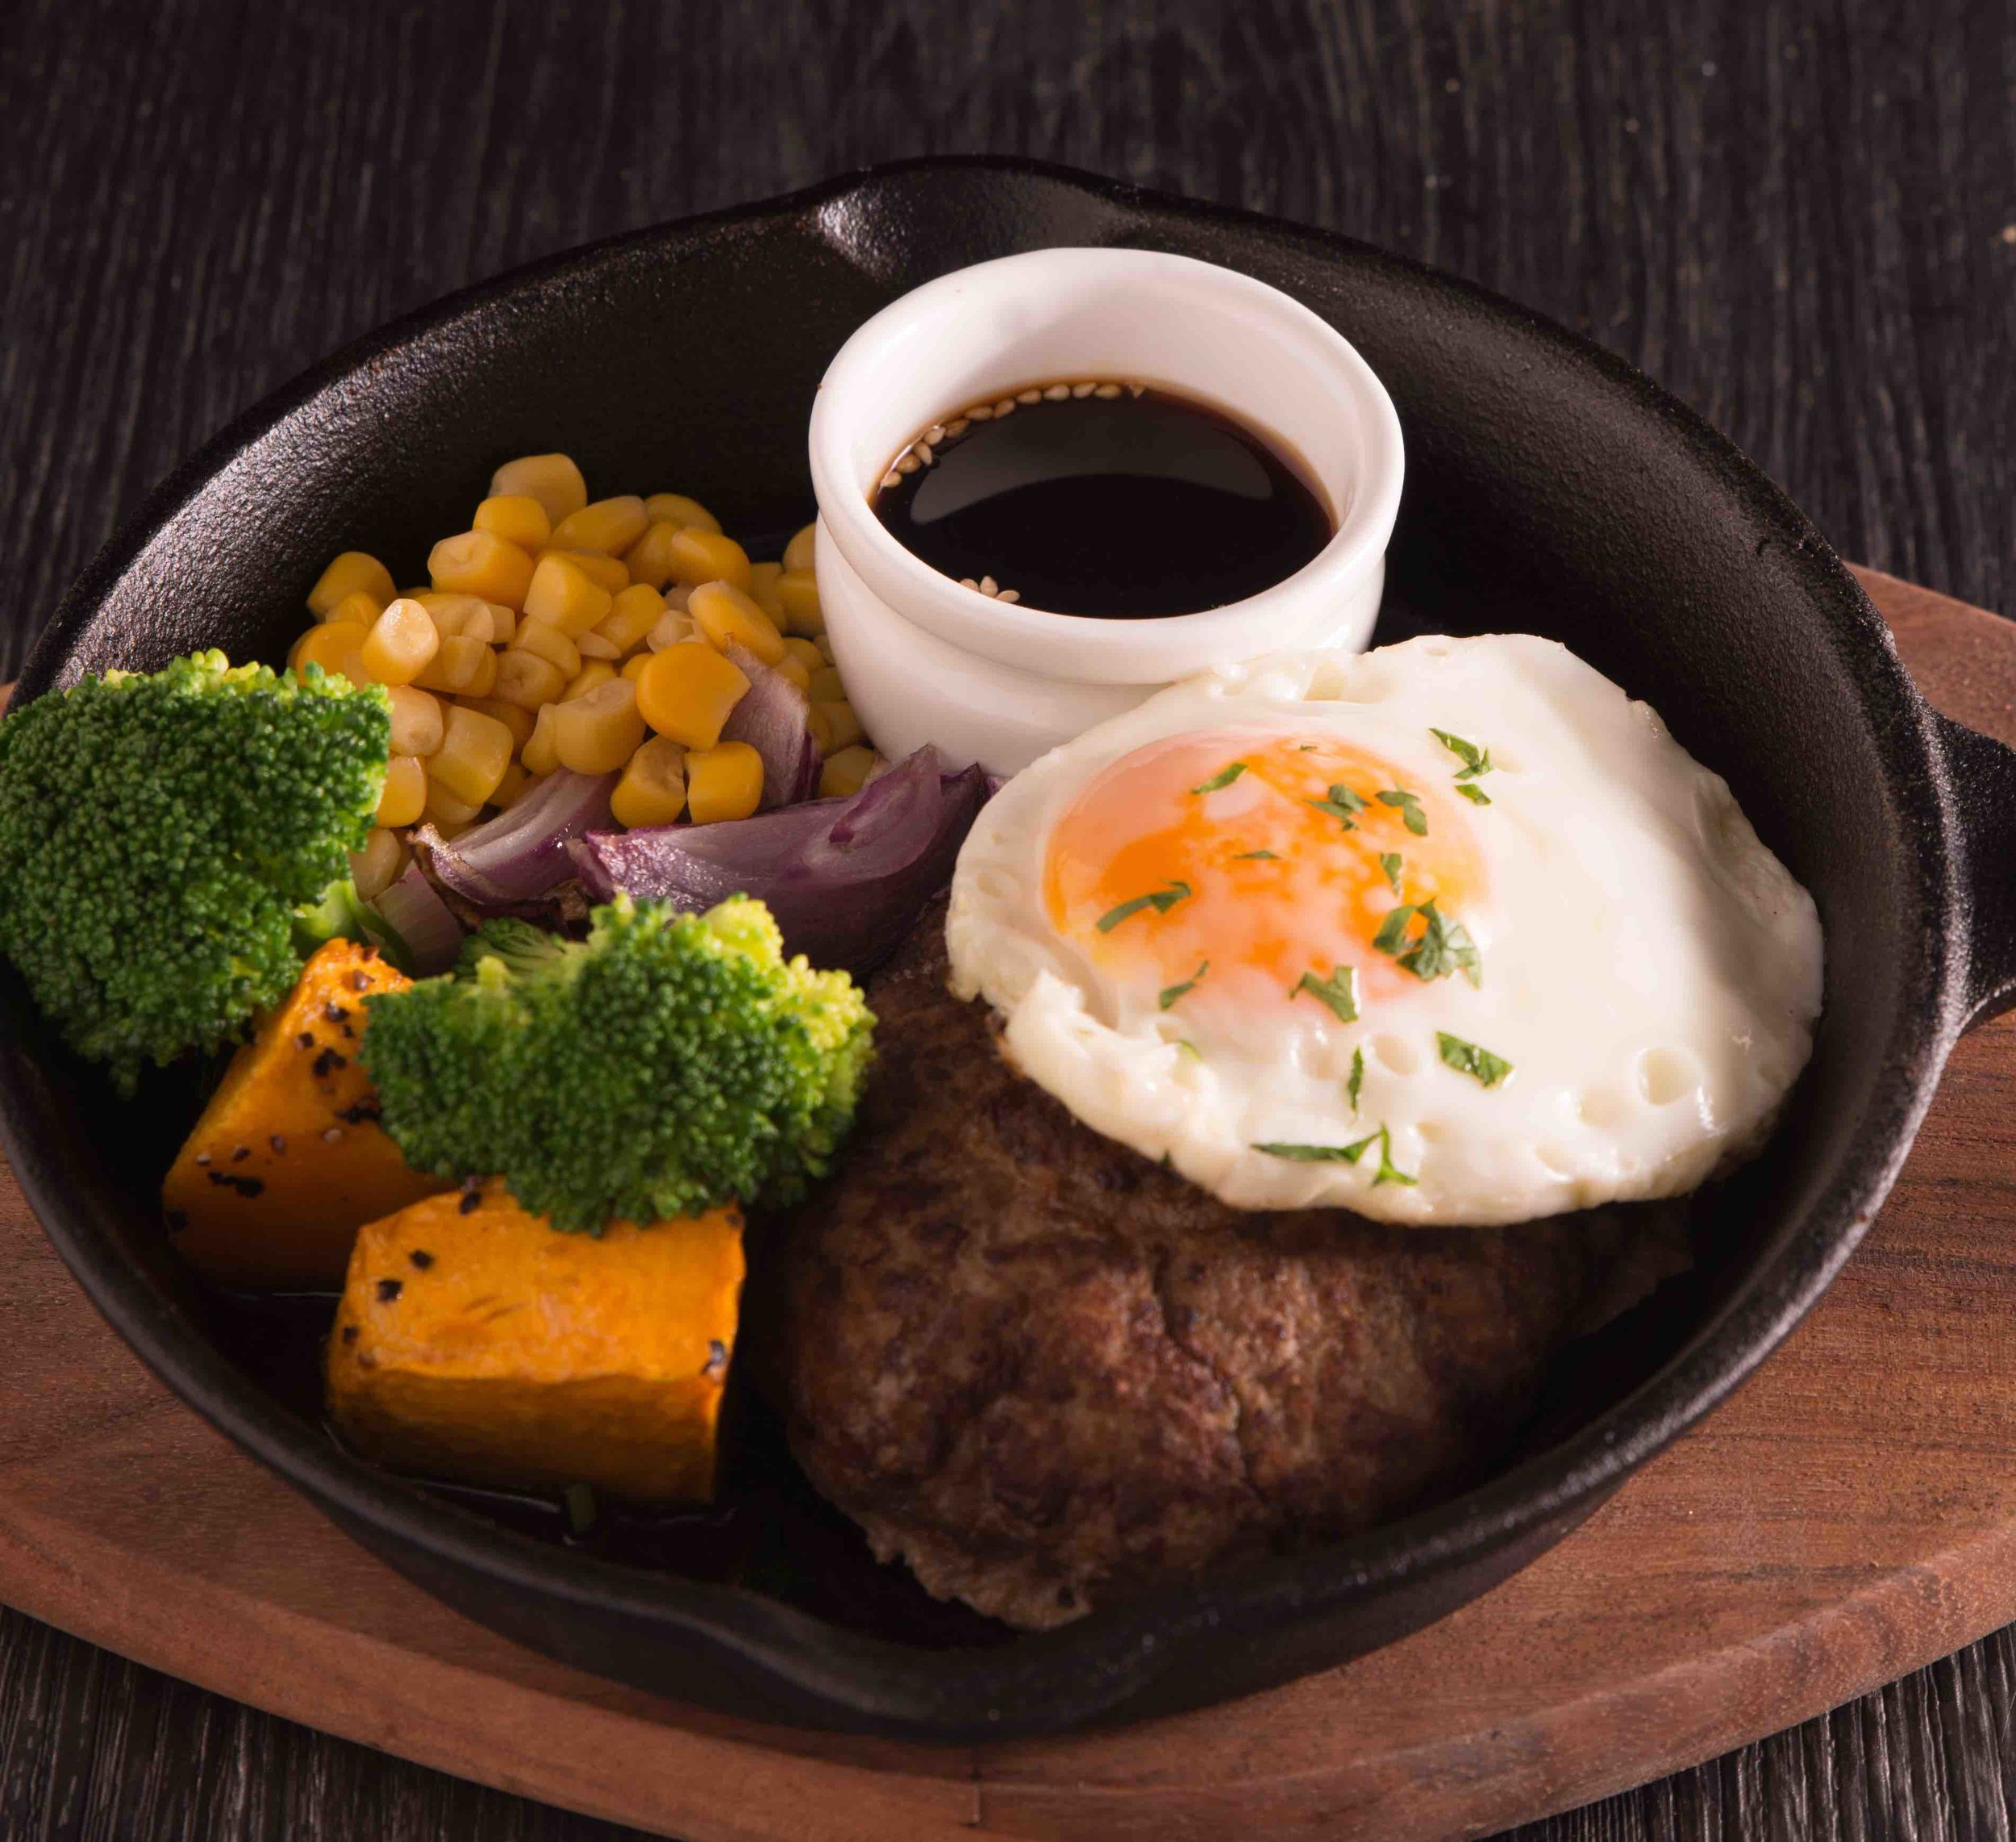 Teri Tama Hamburg (Teriyaki Hamburg steak with a fried egg)